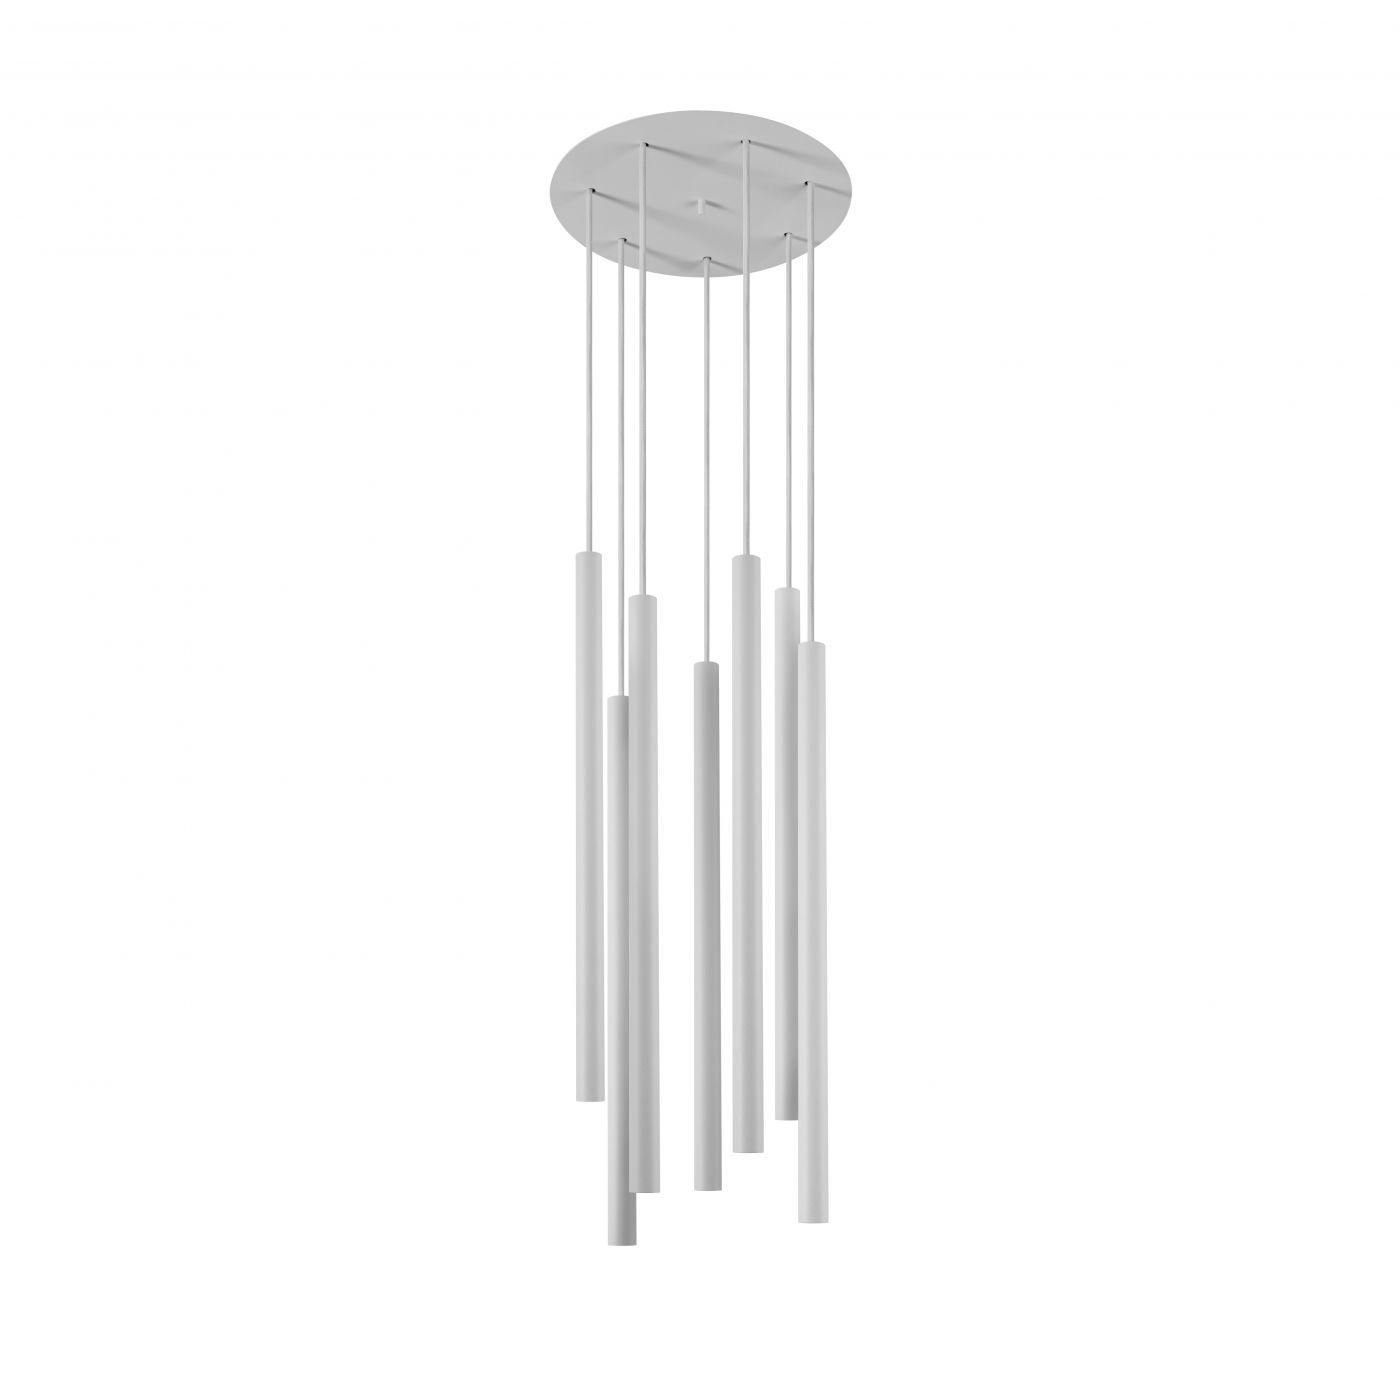 Laser White Vii 8918 - Nowodvorski - lampa wisząca nowoczesna